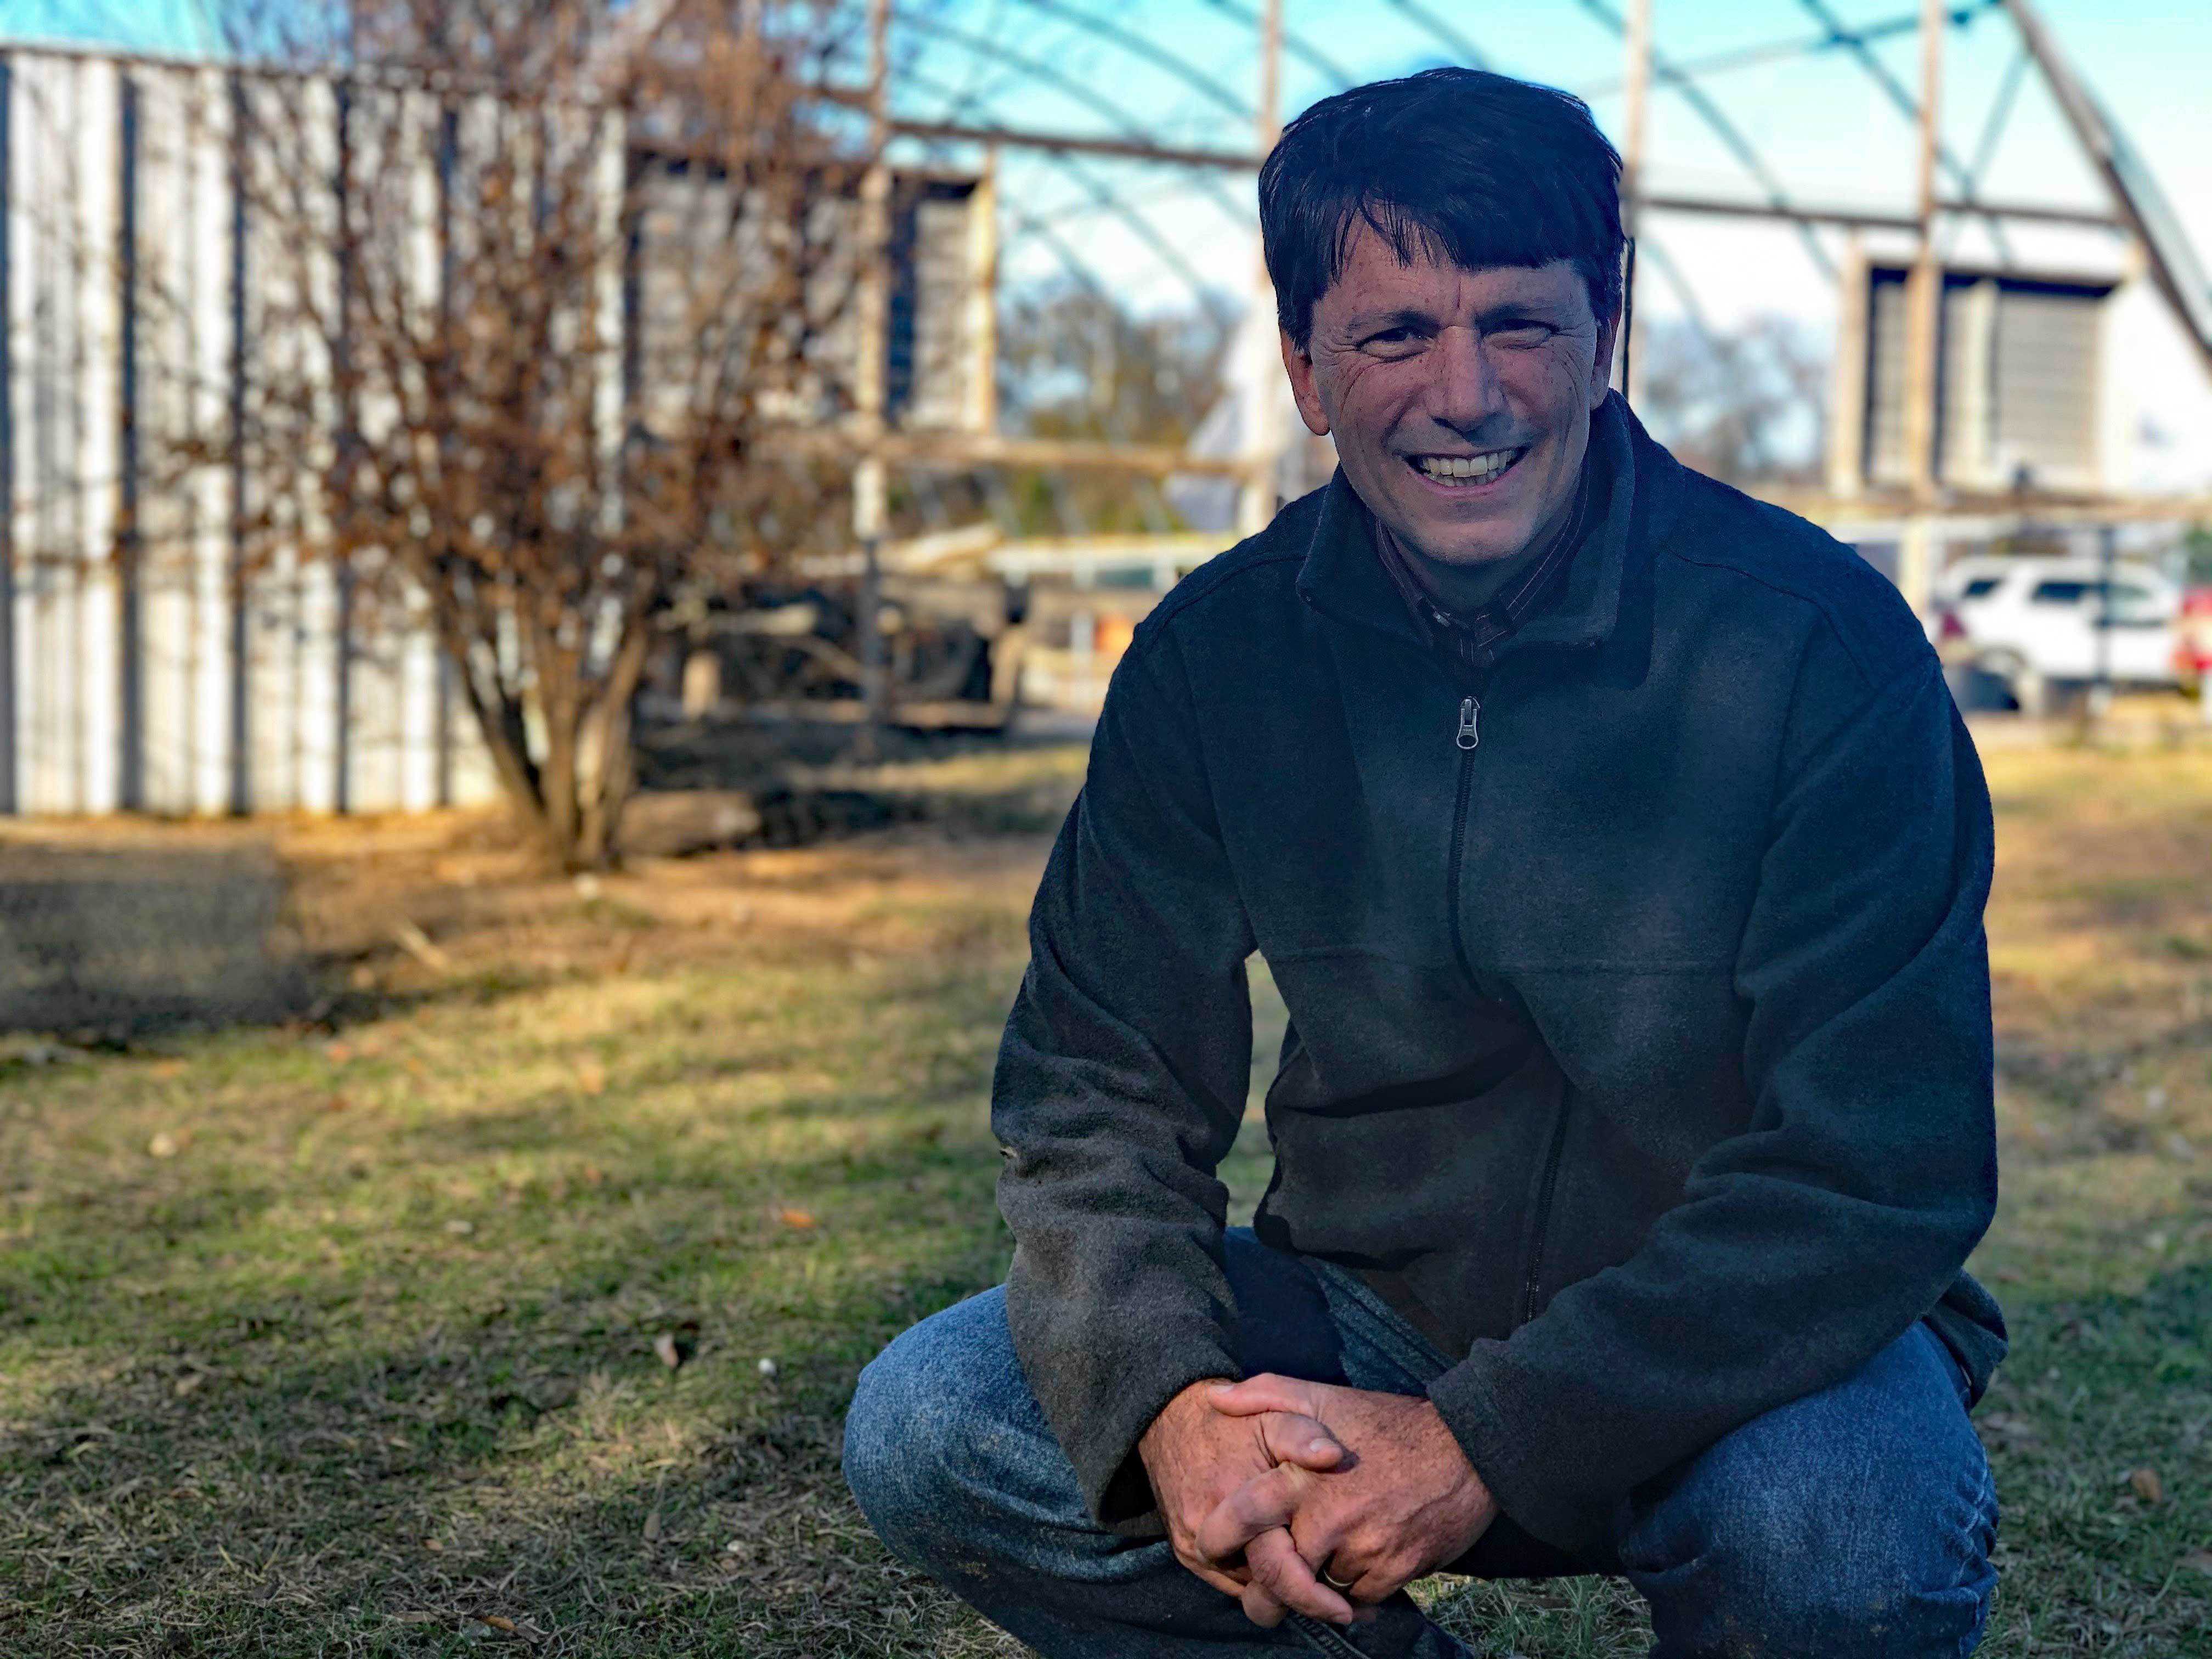 Cody Carnine on his family's pecan farm in Canton, Texas. (Angela MacIvor/CBC)